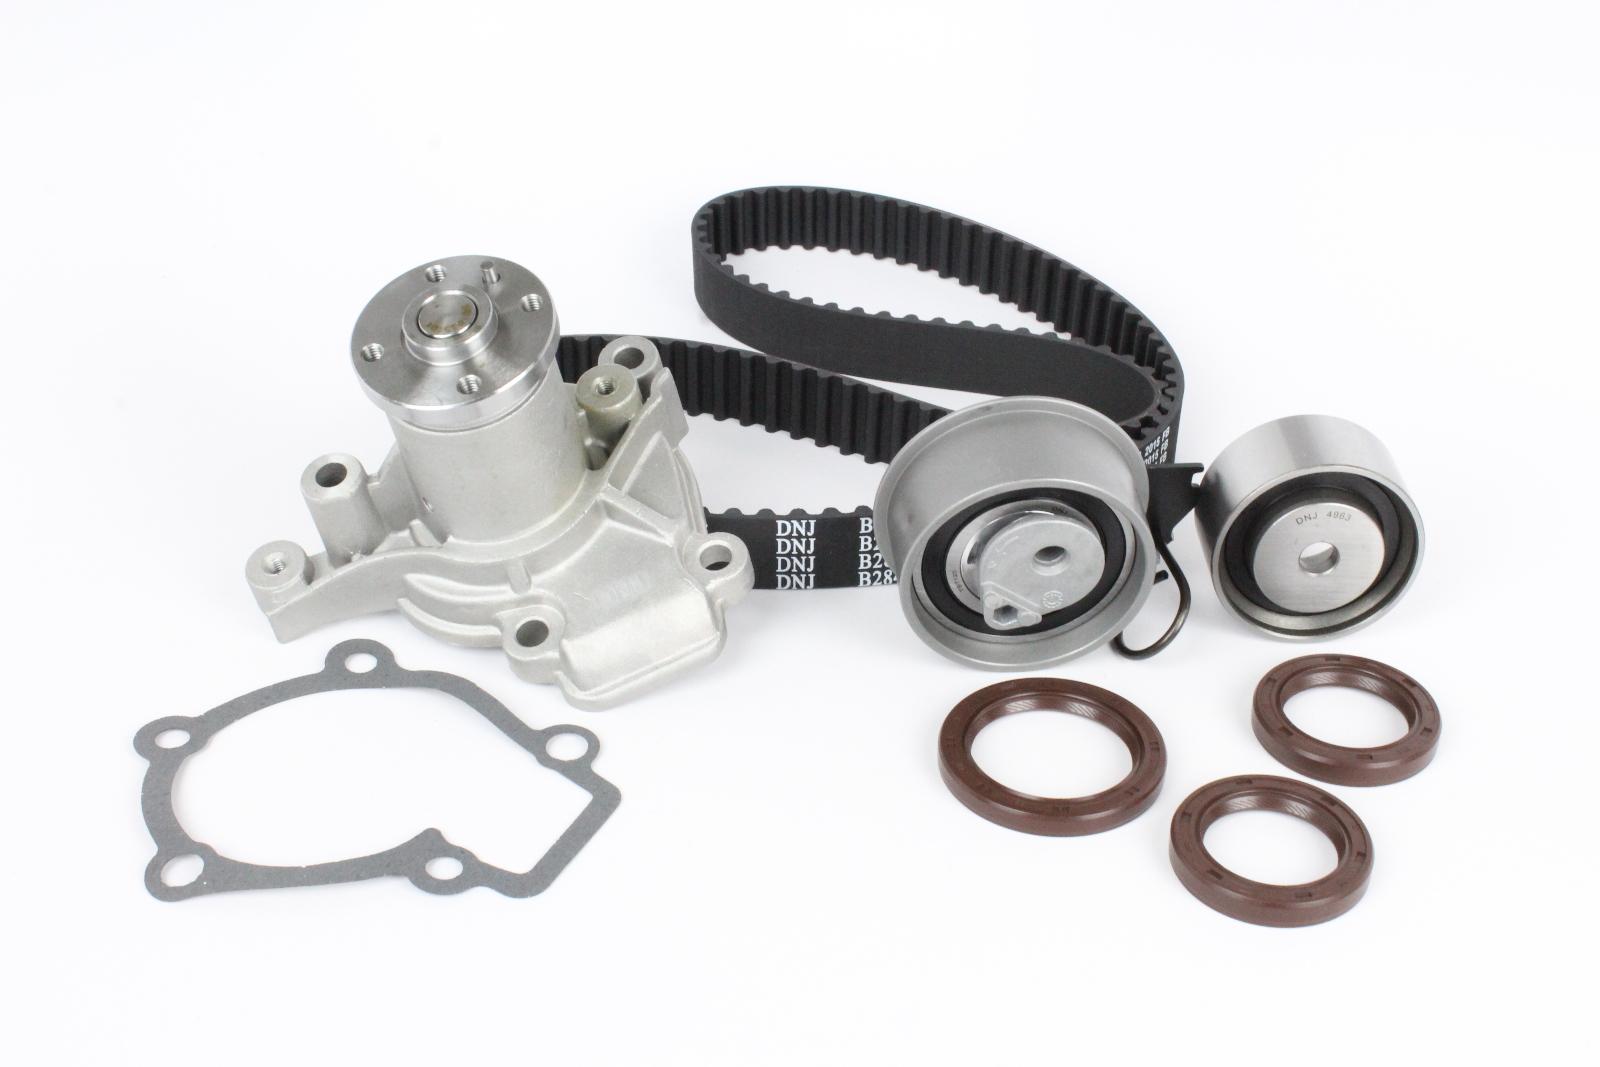 Timing Belt Kit Water Pump Fits 2007-2009 Hyundai Elantra Tucson Tiburon  2.0L | eBay | Hyundai Timing Belt |  | eBay